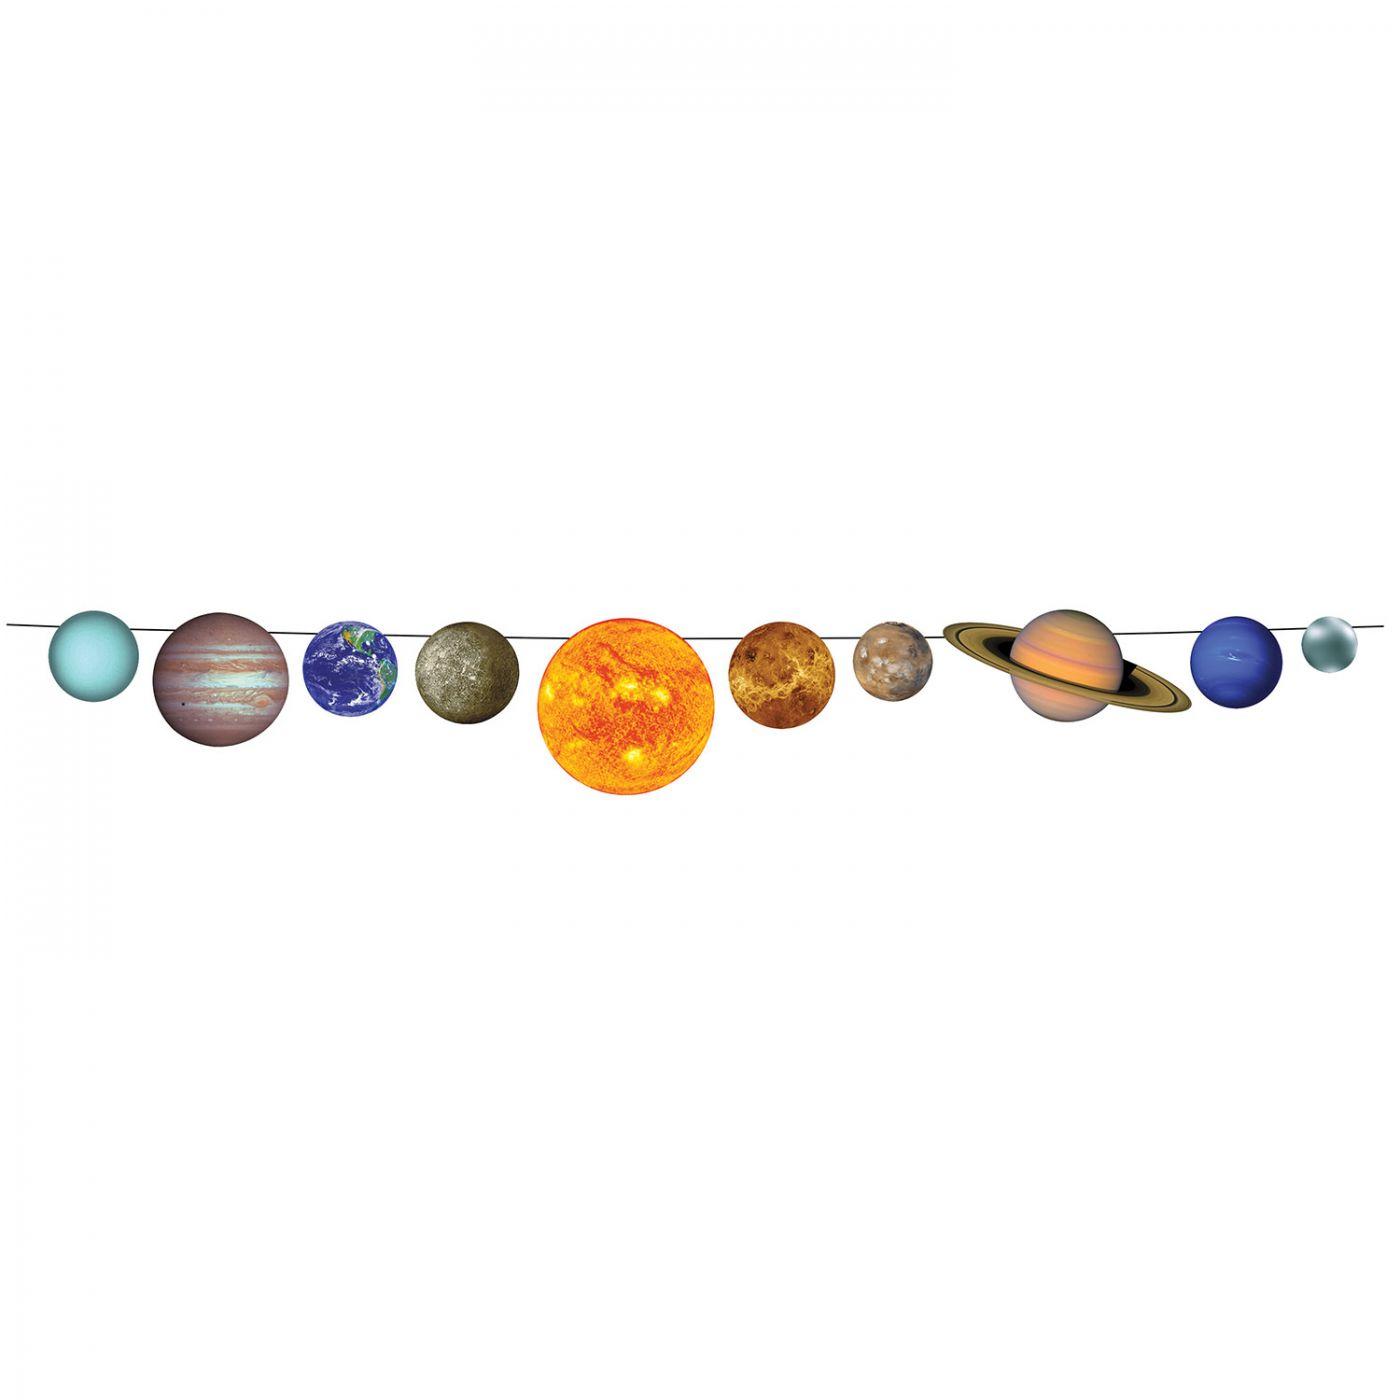 Solar System Streamer image